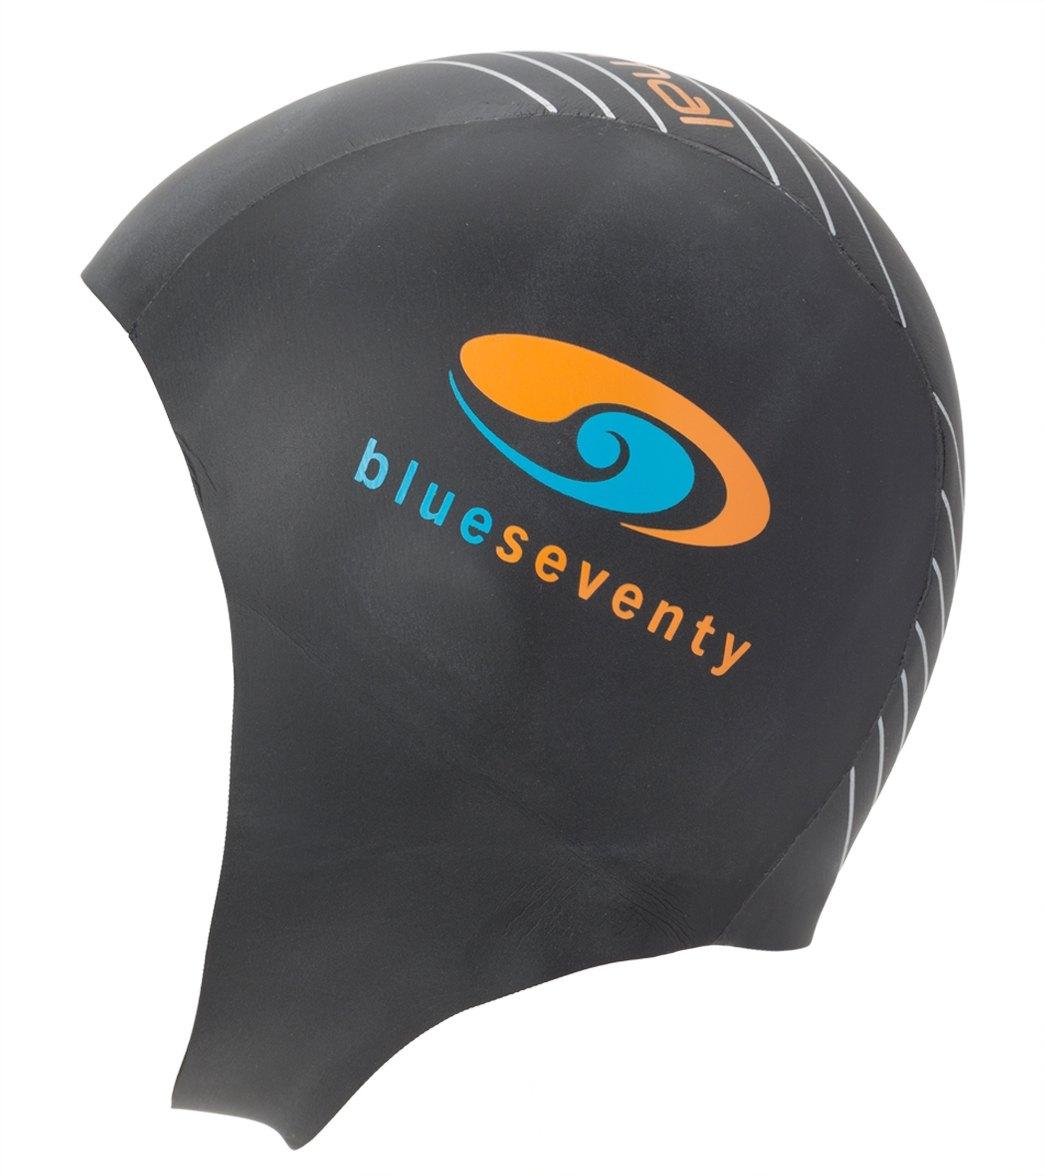 43ac3572799 Blueseventy Thermal Skull Cap at SwimOutlet.com